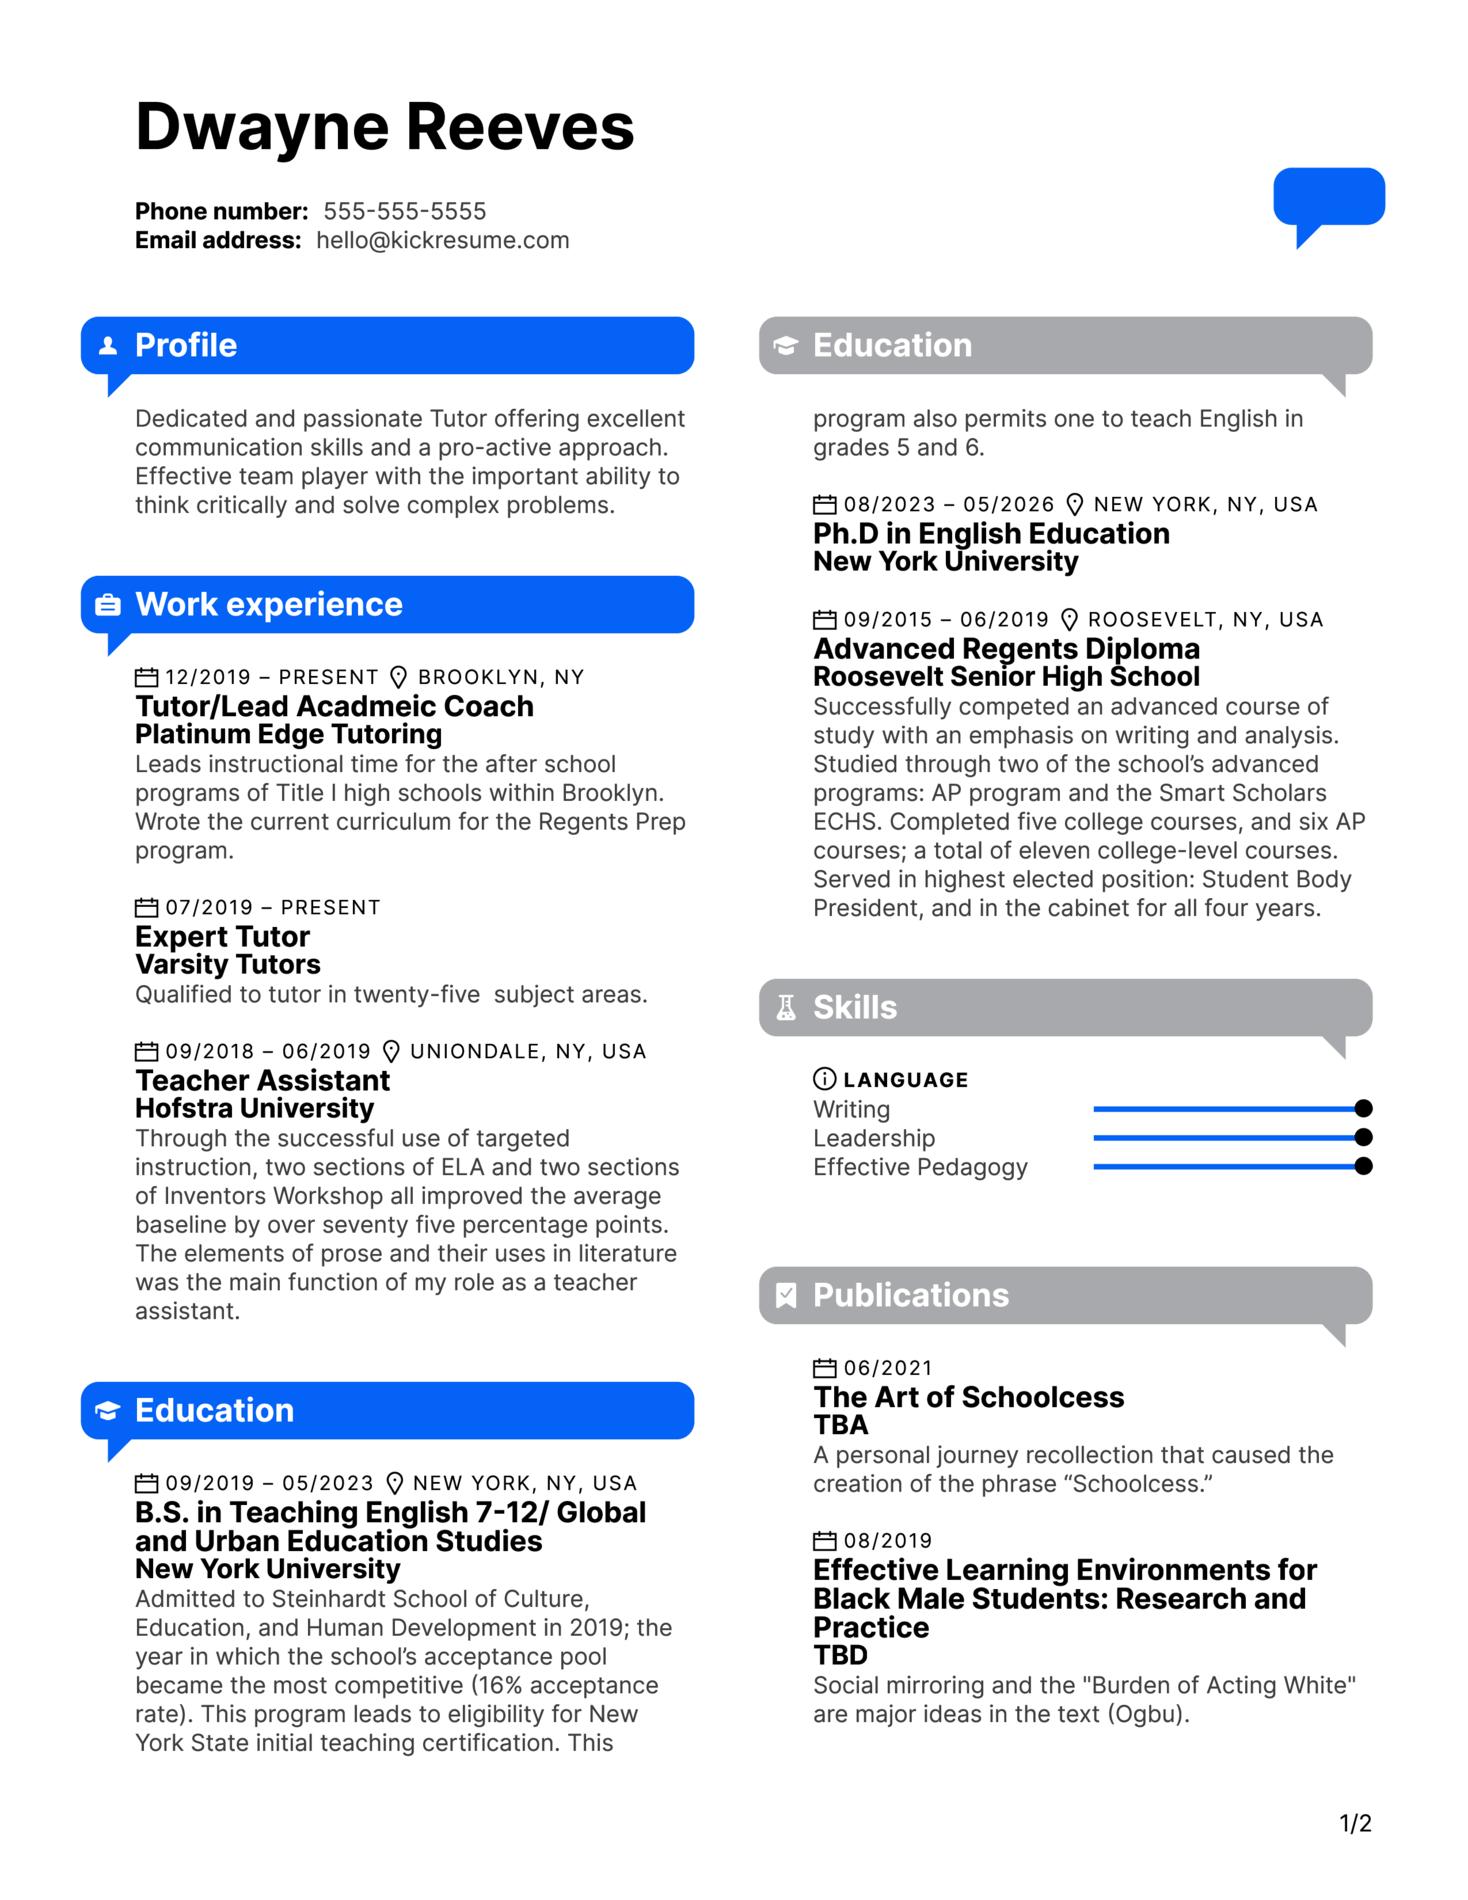 Tutor Resume Sample (Part 1)